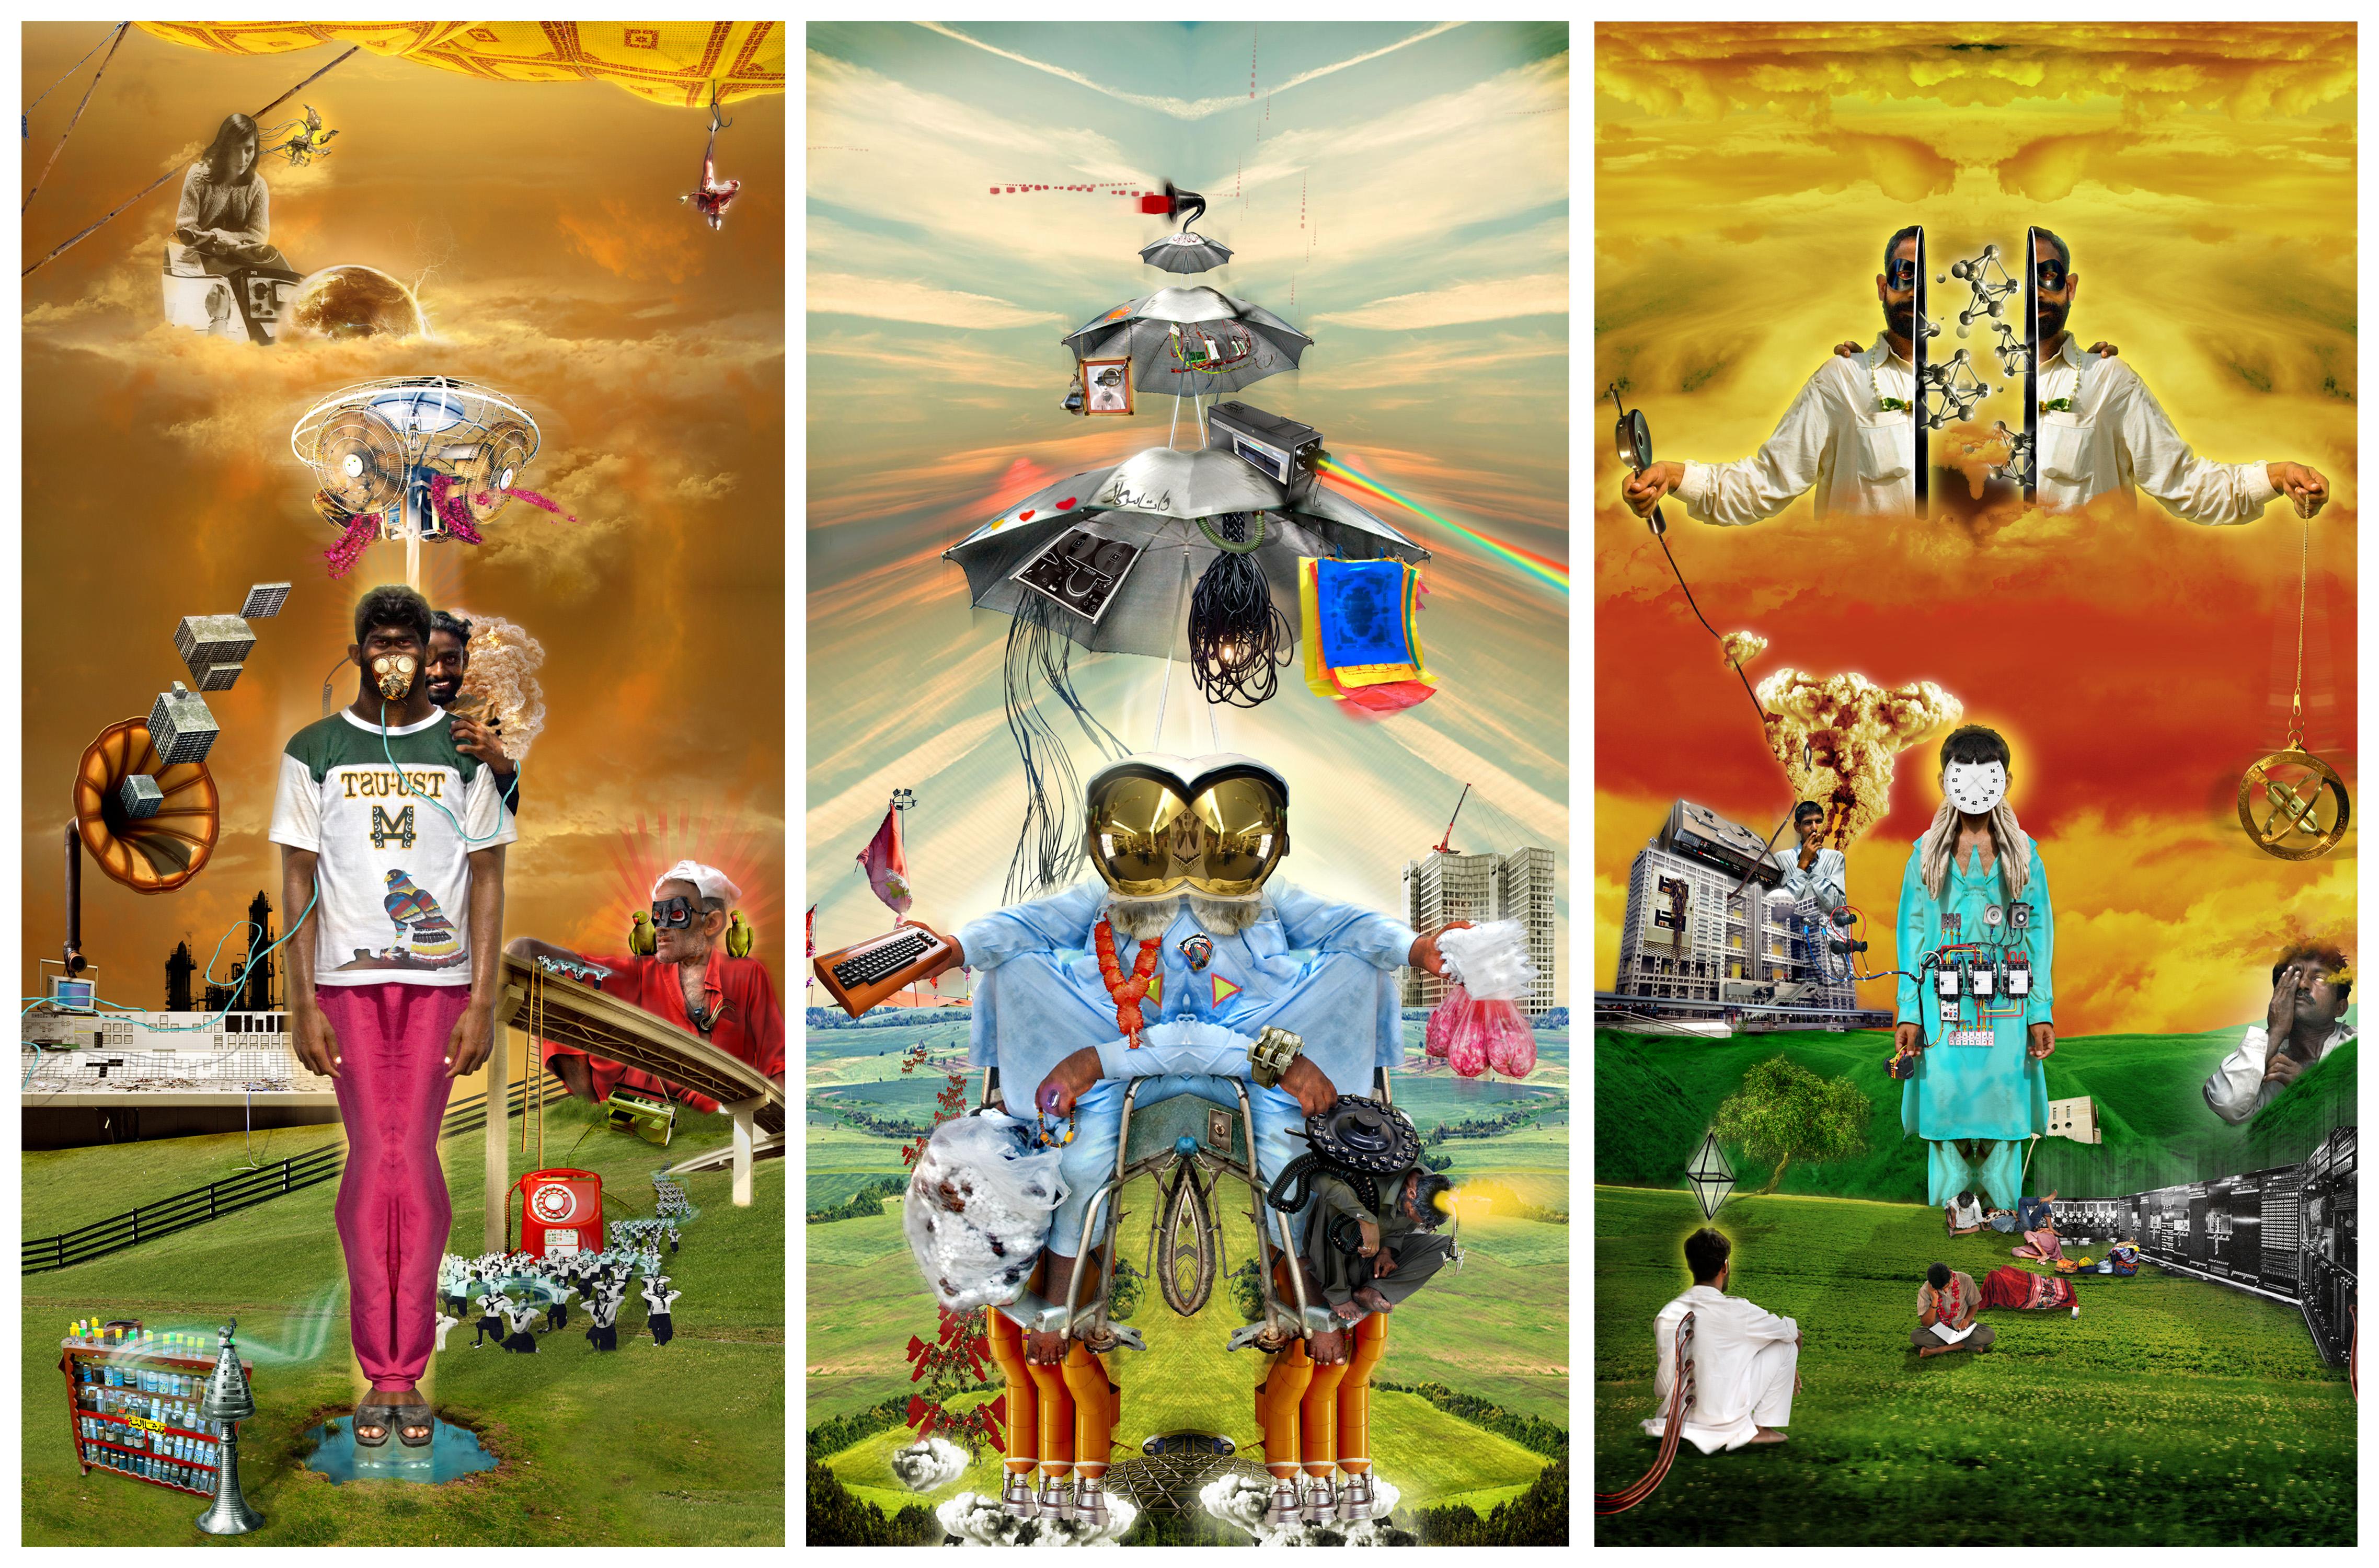 2013-08-26-Murtaza_Triptych_20092013.jpg